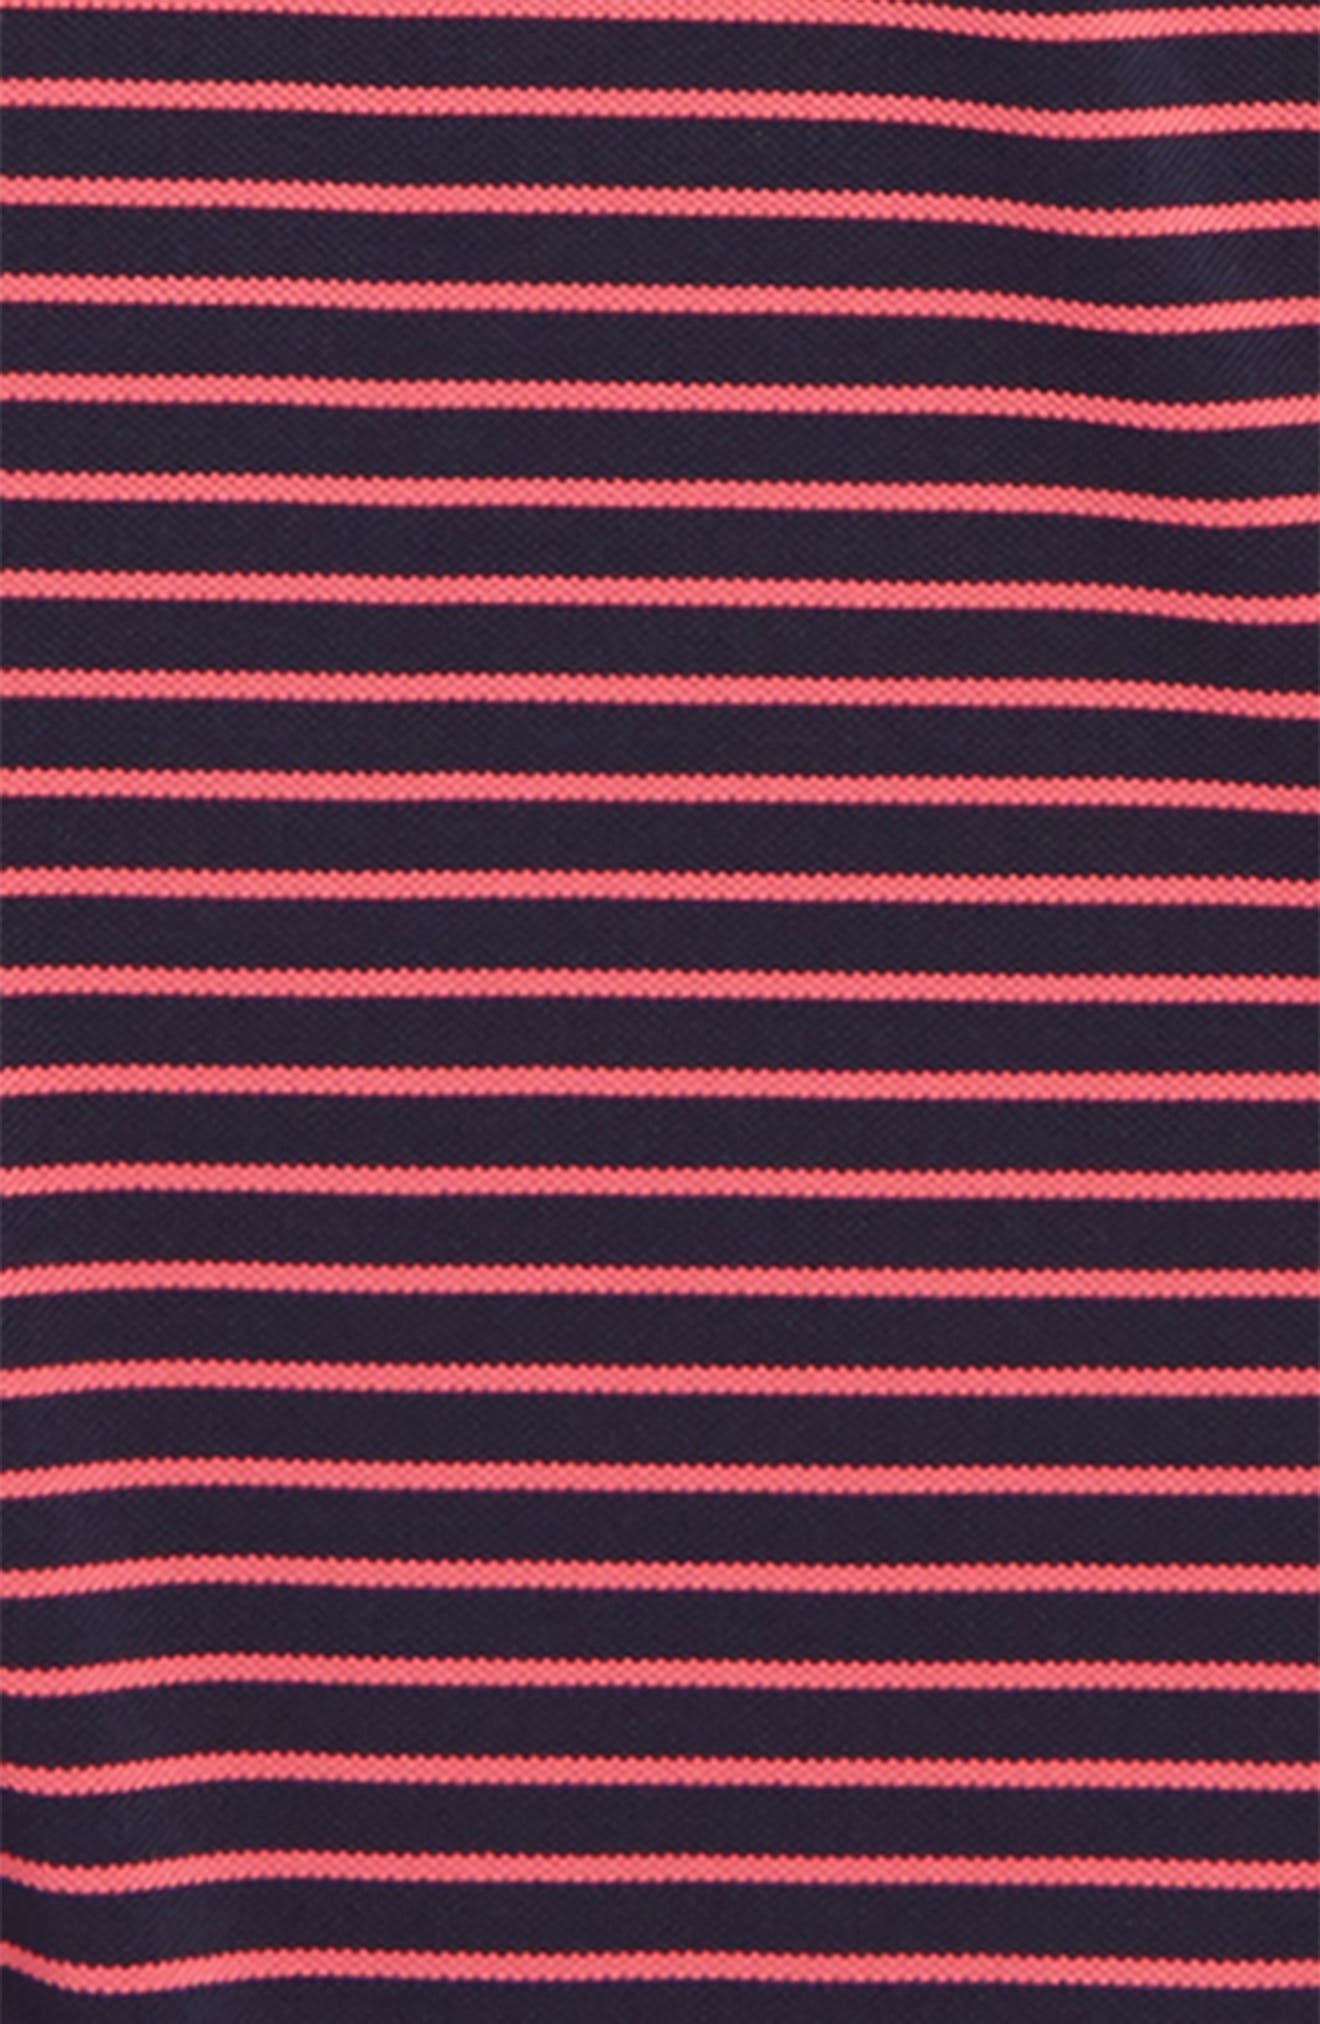 Myers Stripe Polo,                             Alternate thumbnail 2, color,                             650